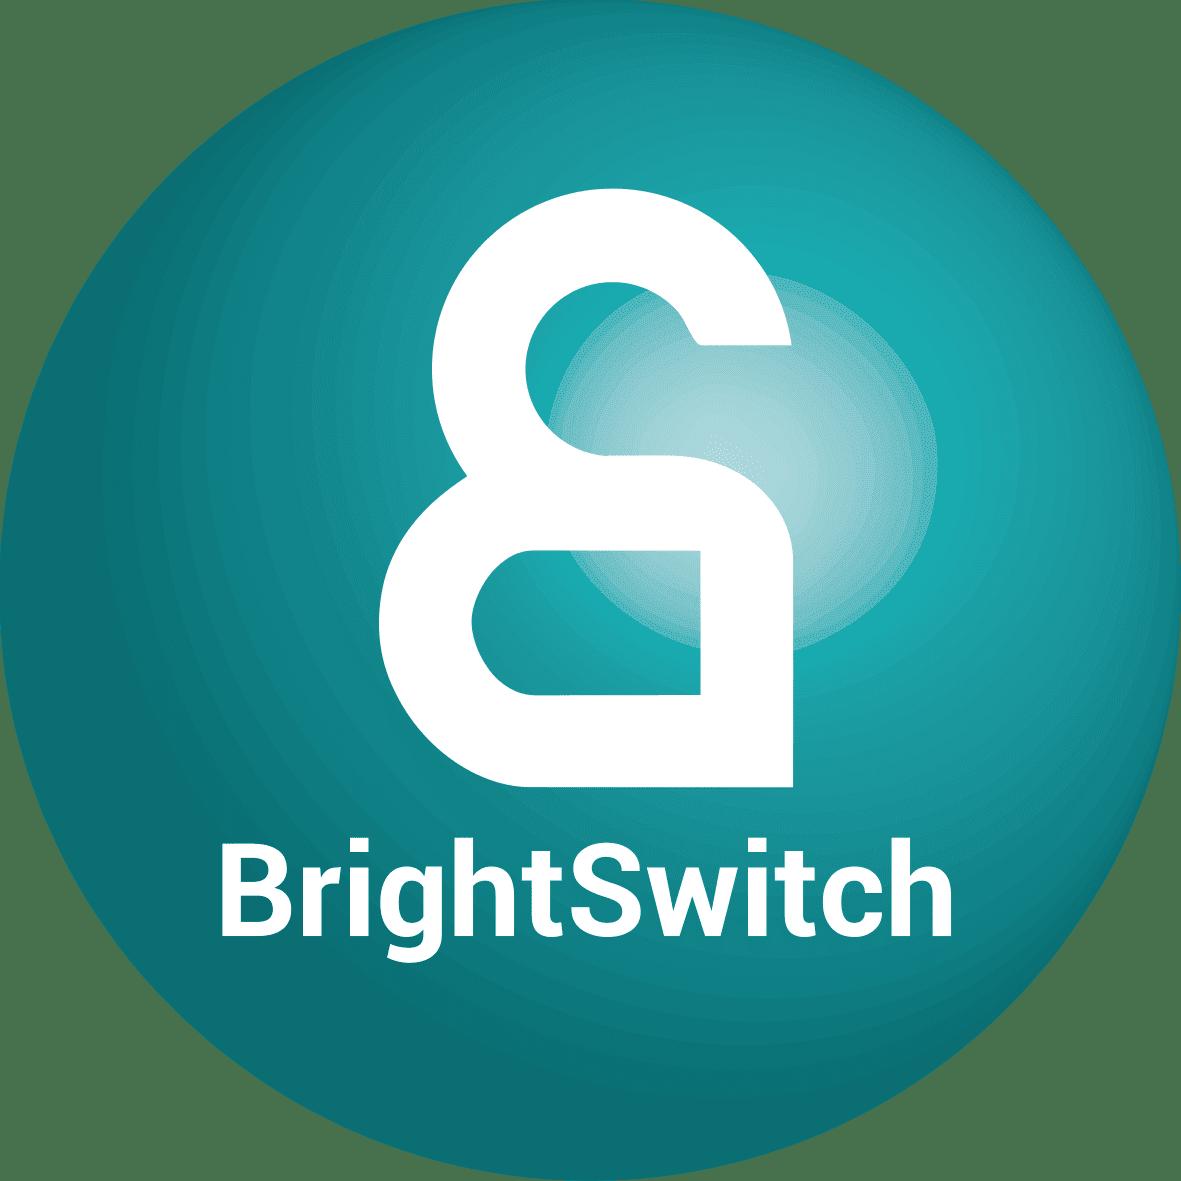 BrightSwitch Ltd